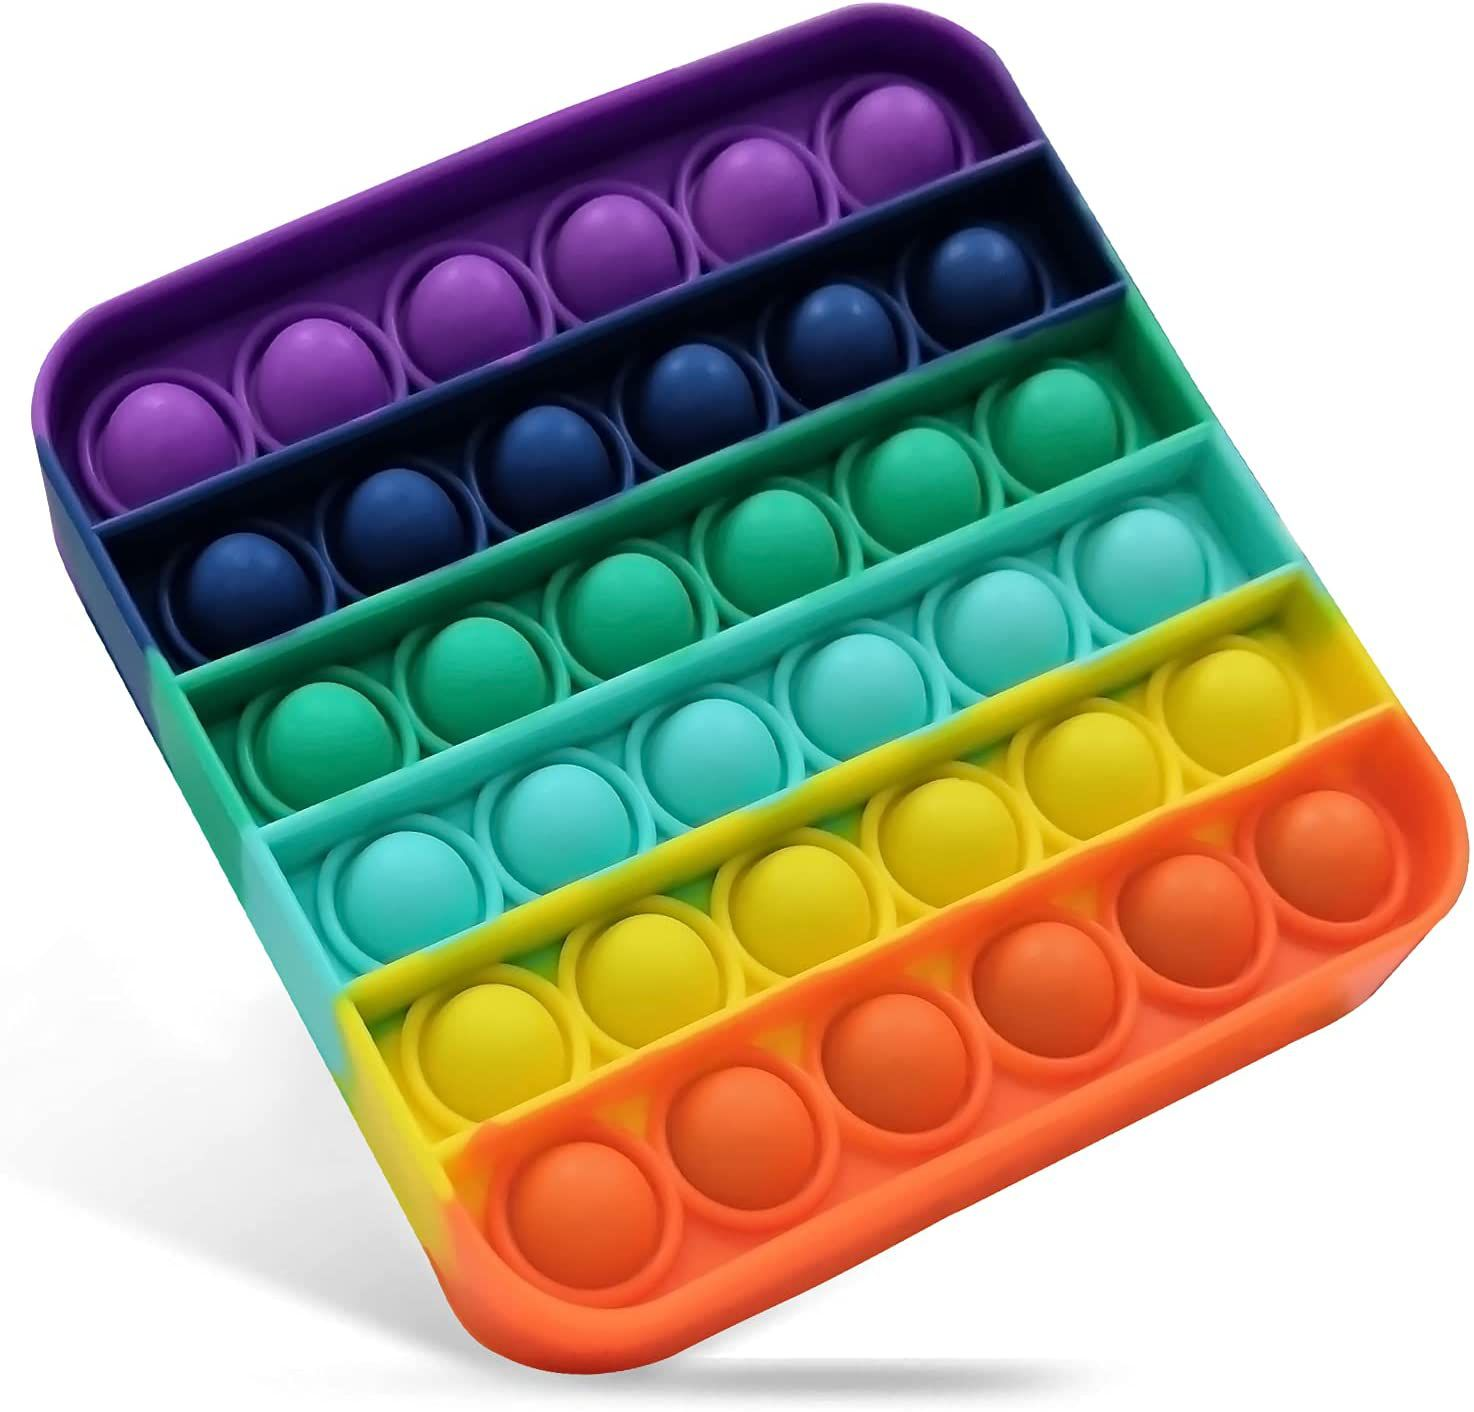 AKSDTH Push and Pop Bubble Fidget Sensory Toy